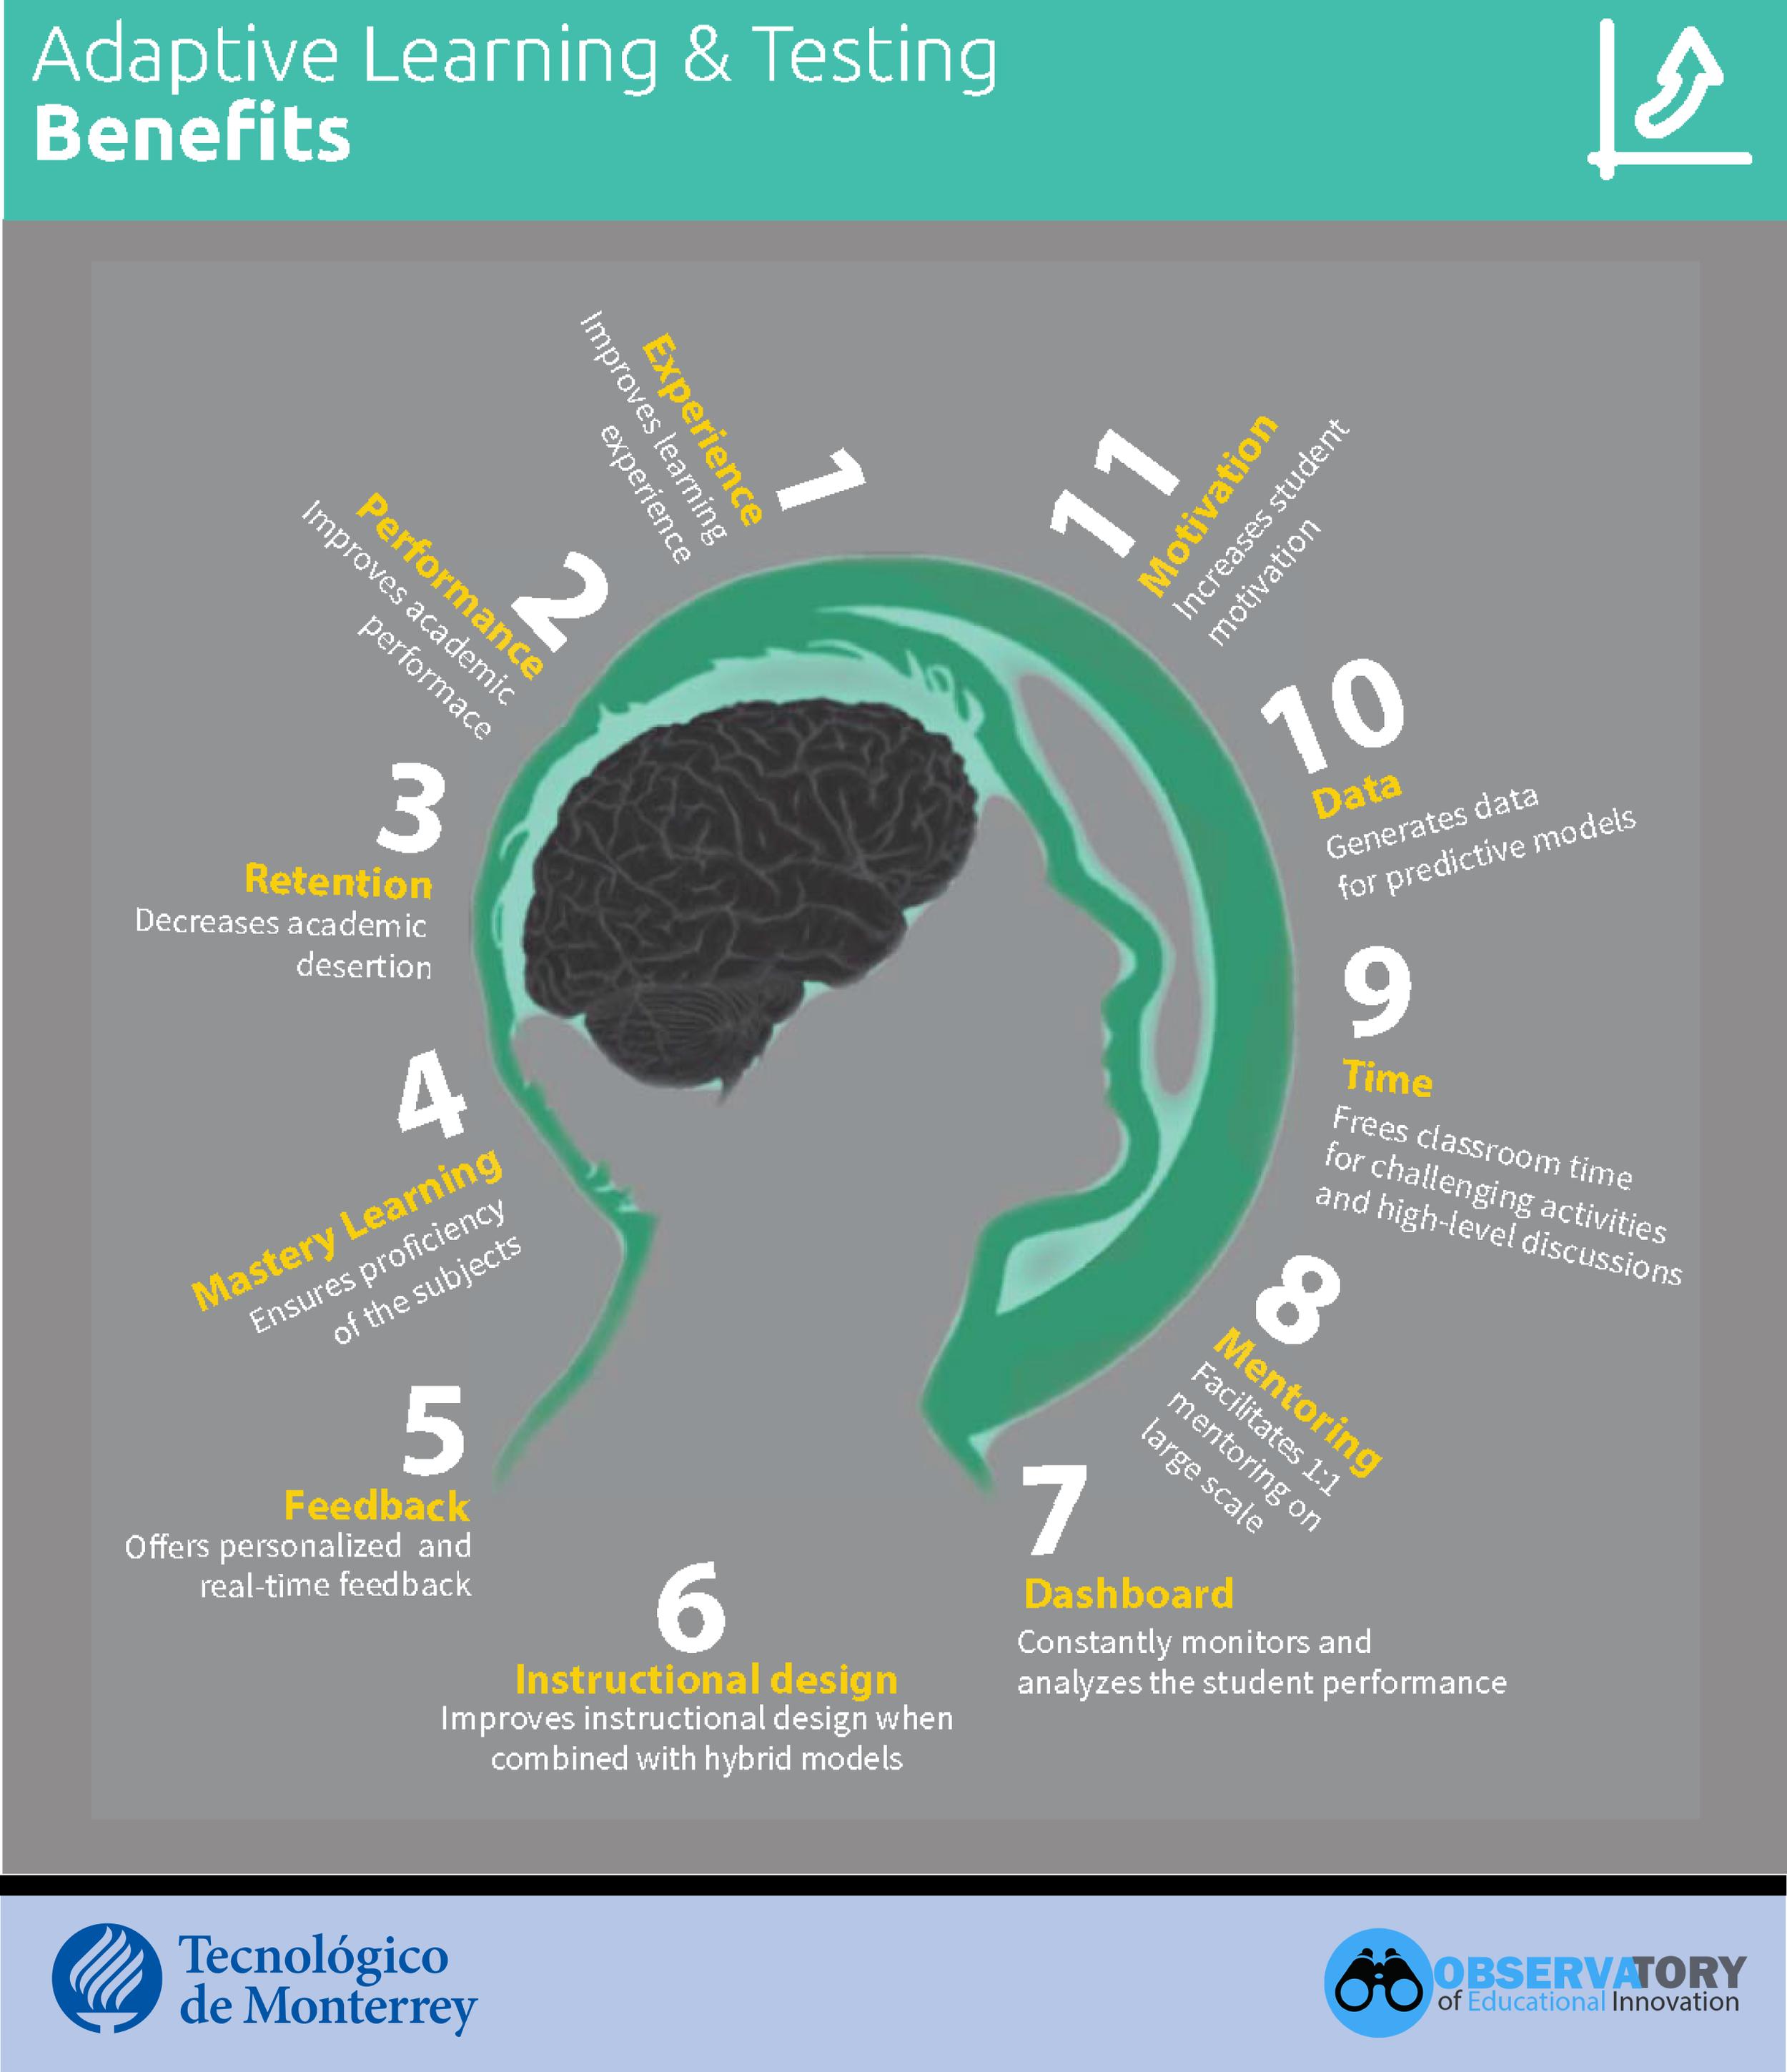 Adaptive Learning Benefits